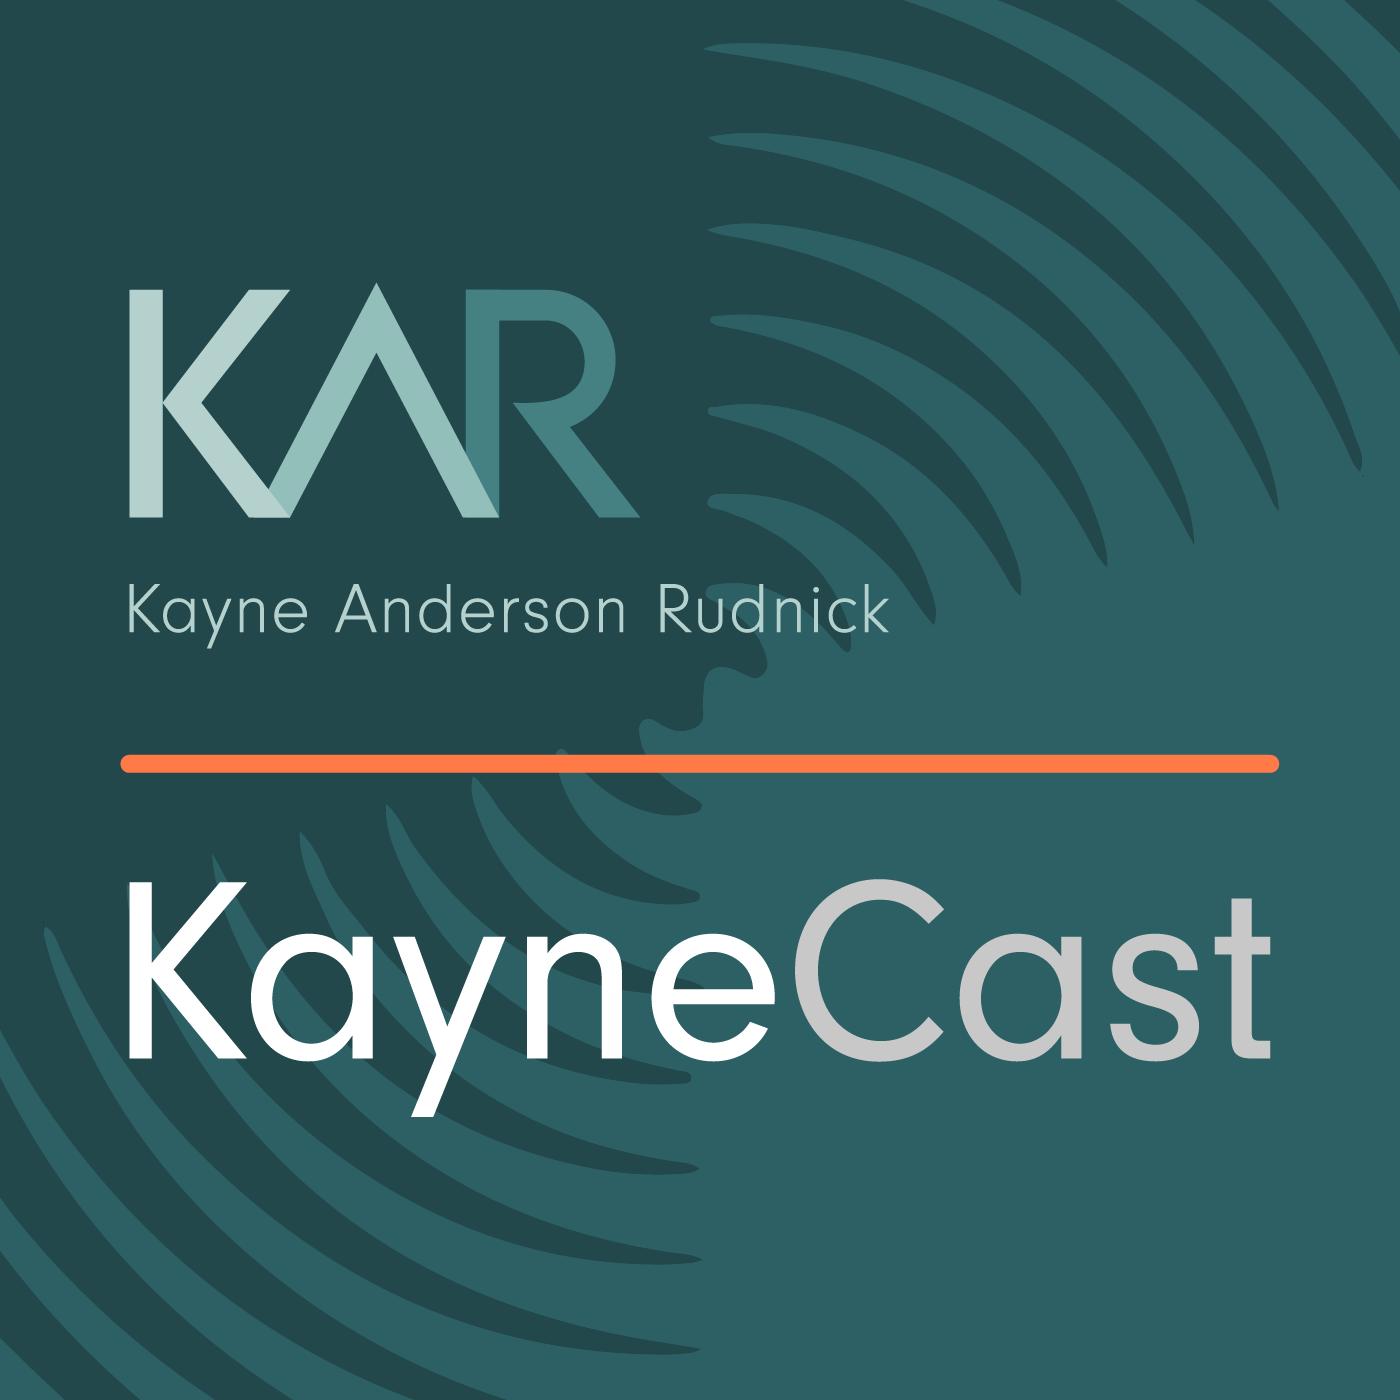 KAR Podcast Logo